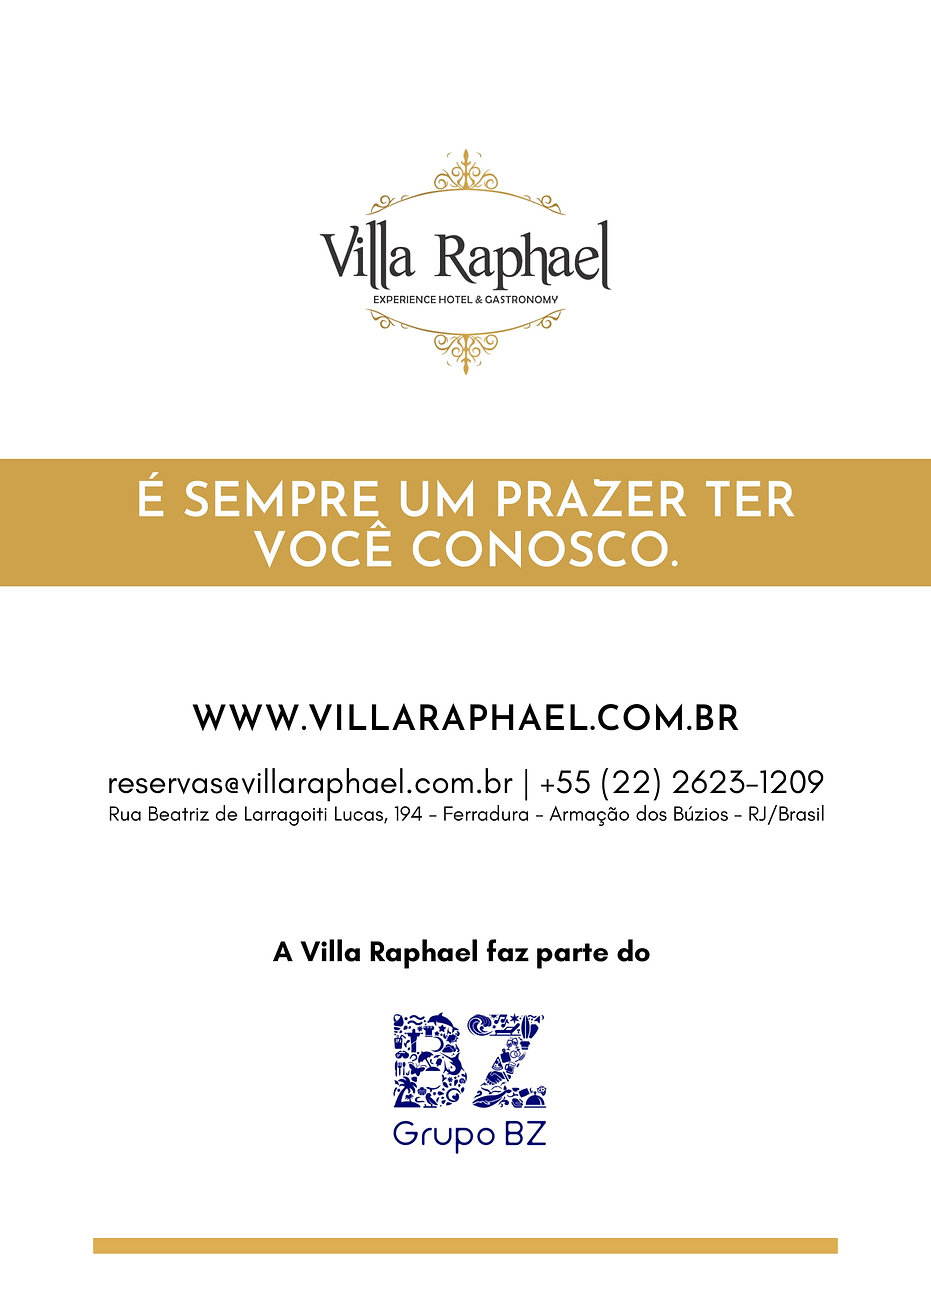 Cartilha CORONAVÍRUS_Villa Raphael-7.jpg